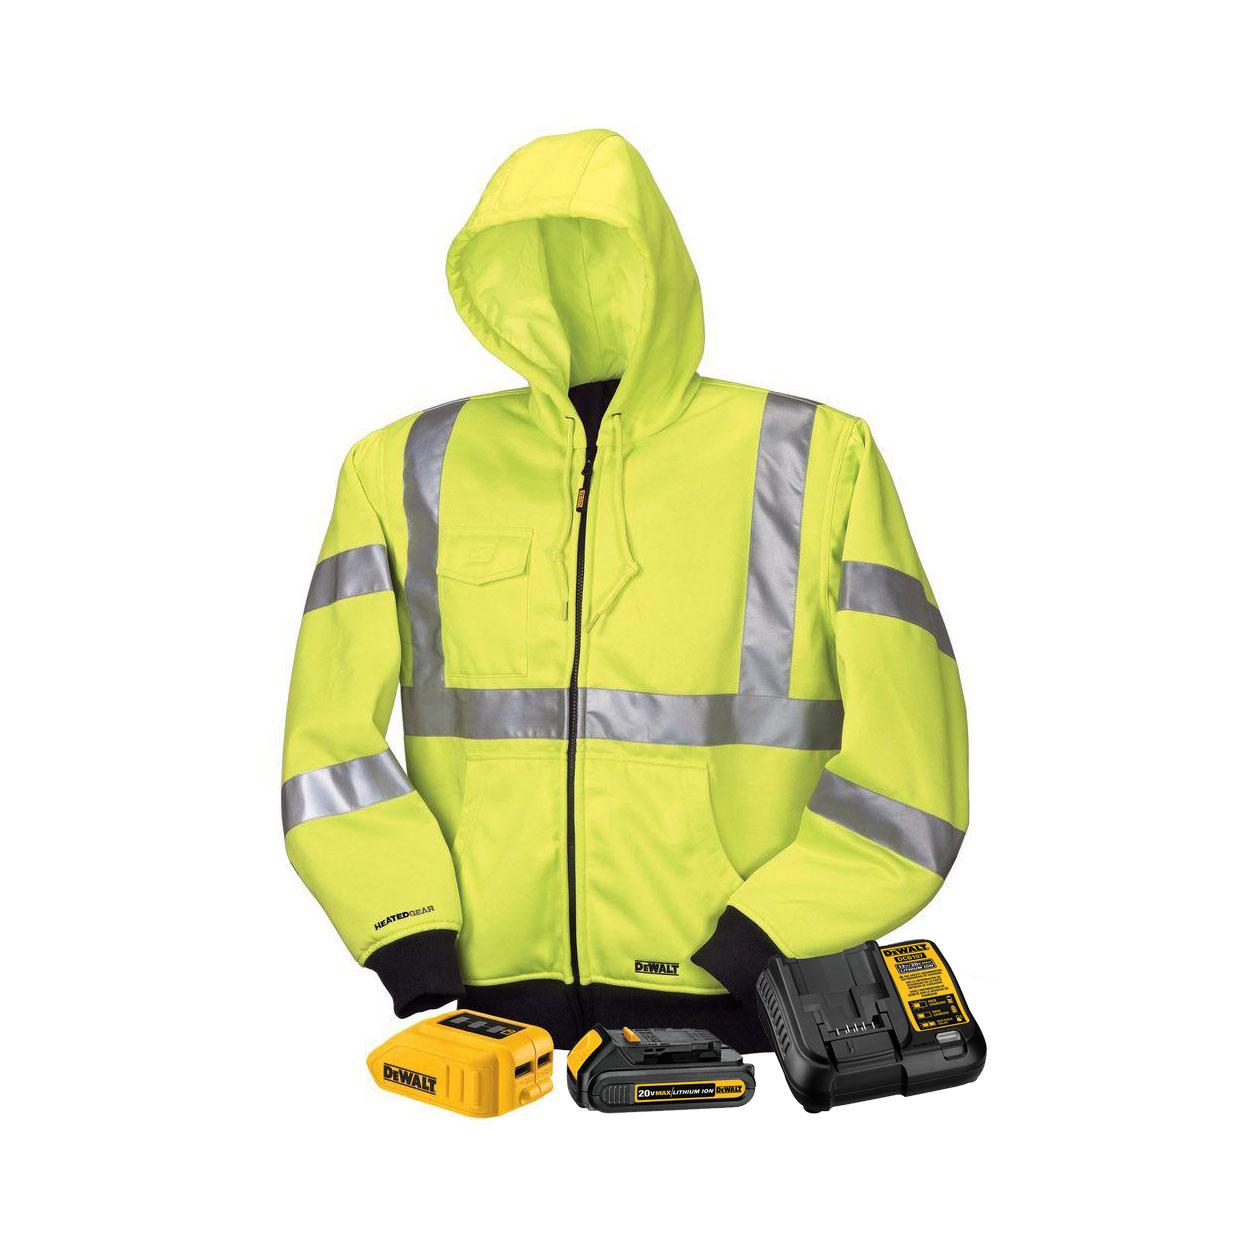 DeWALT DCHJ071C1 Unisex Yellow High Visibility MAX Heated ...